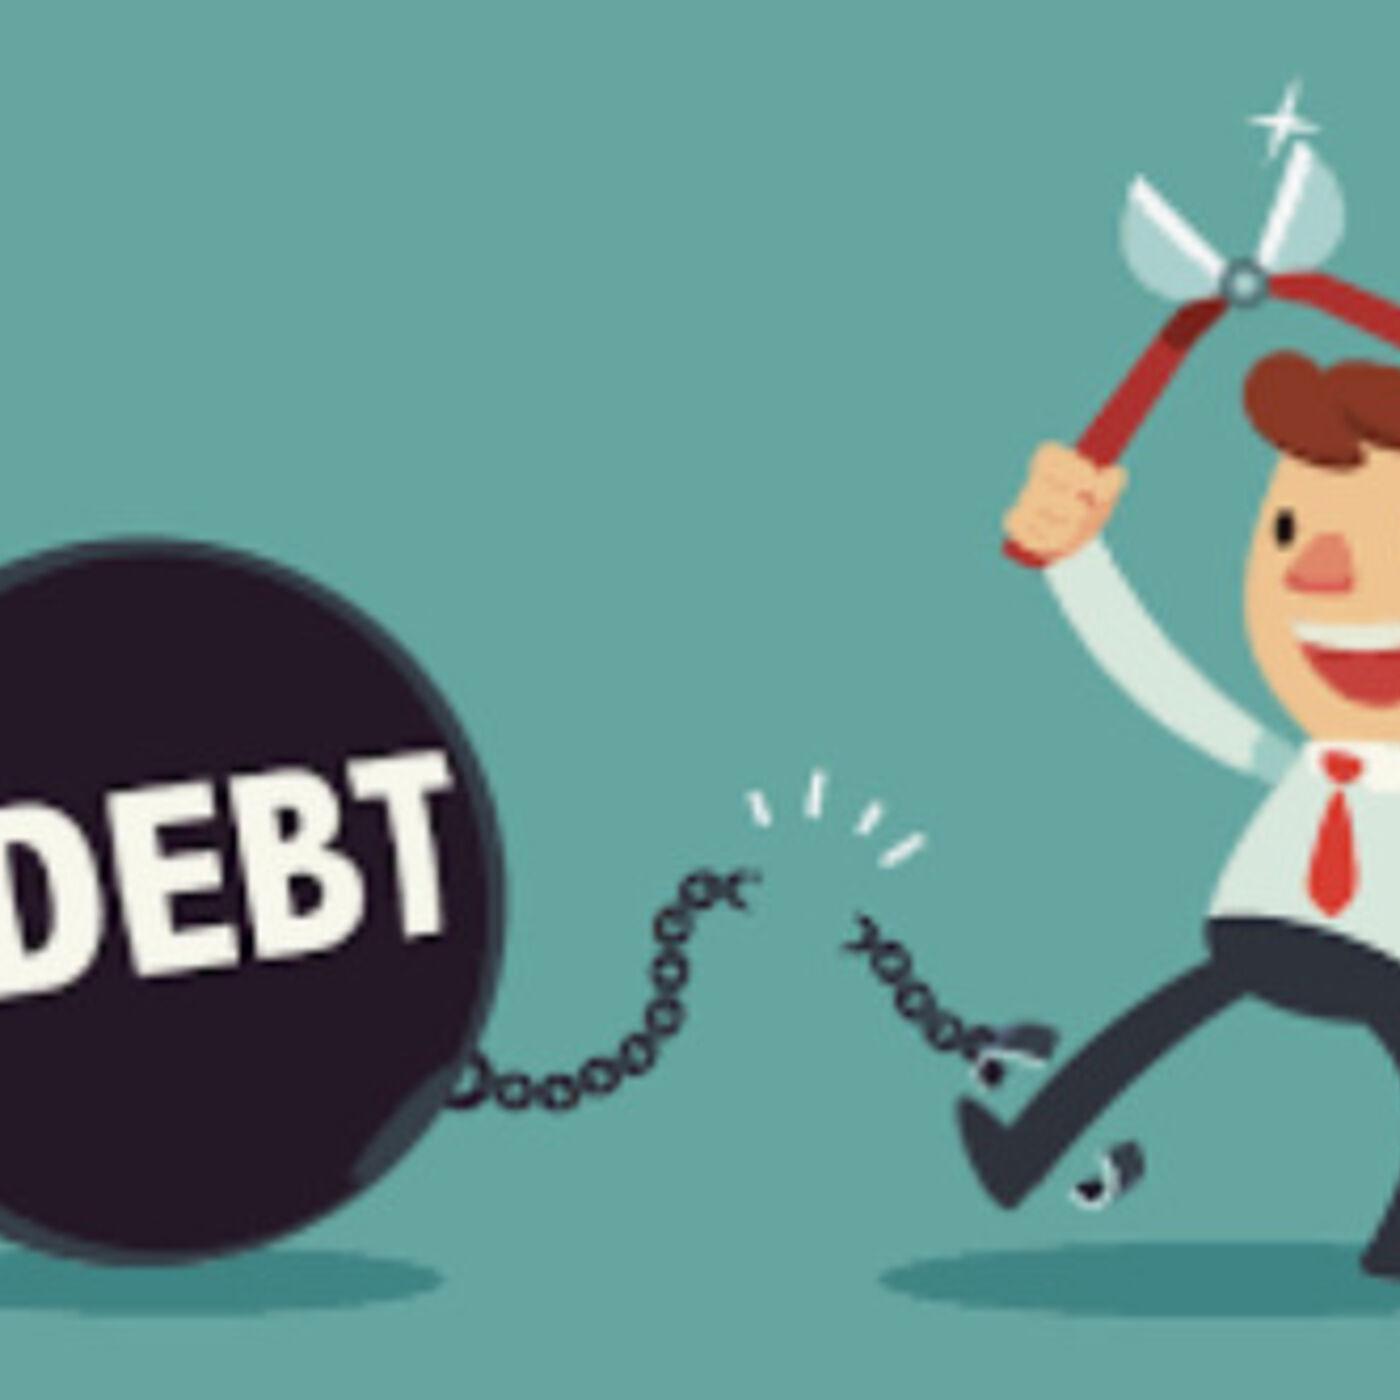 Mr. Crypto Takes Aim at Debt